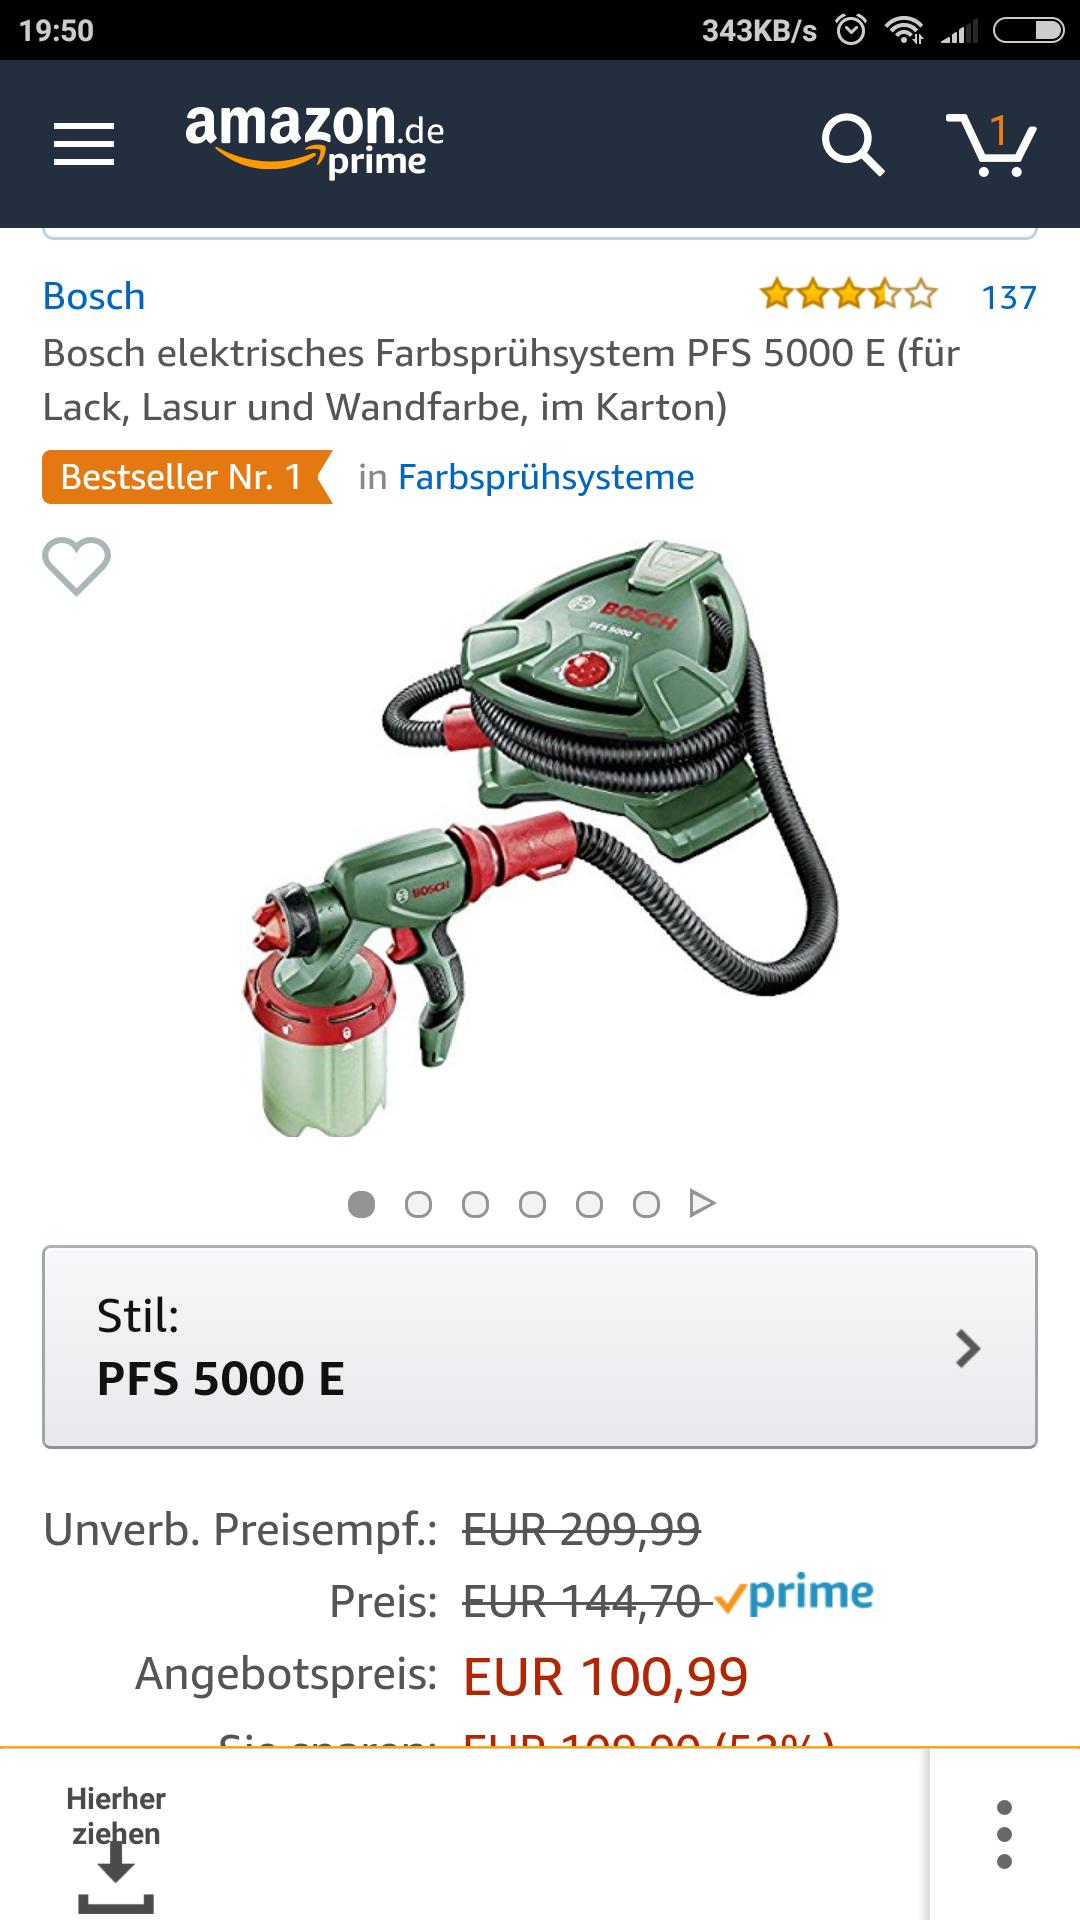 Bosch Farbsprühsystem PFS 500 E